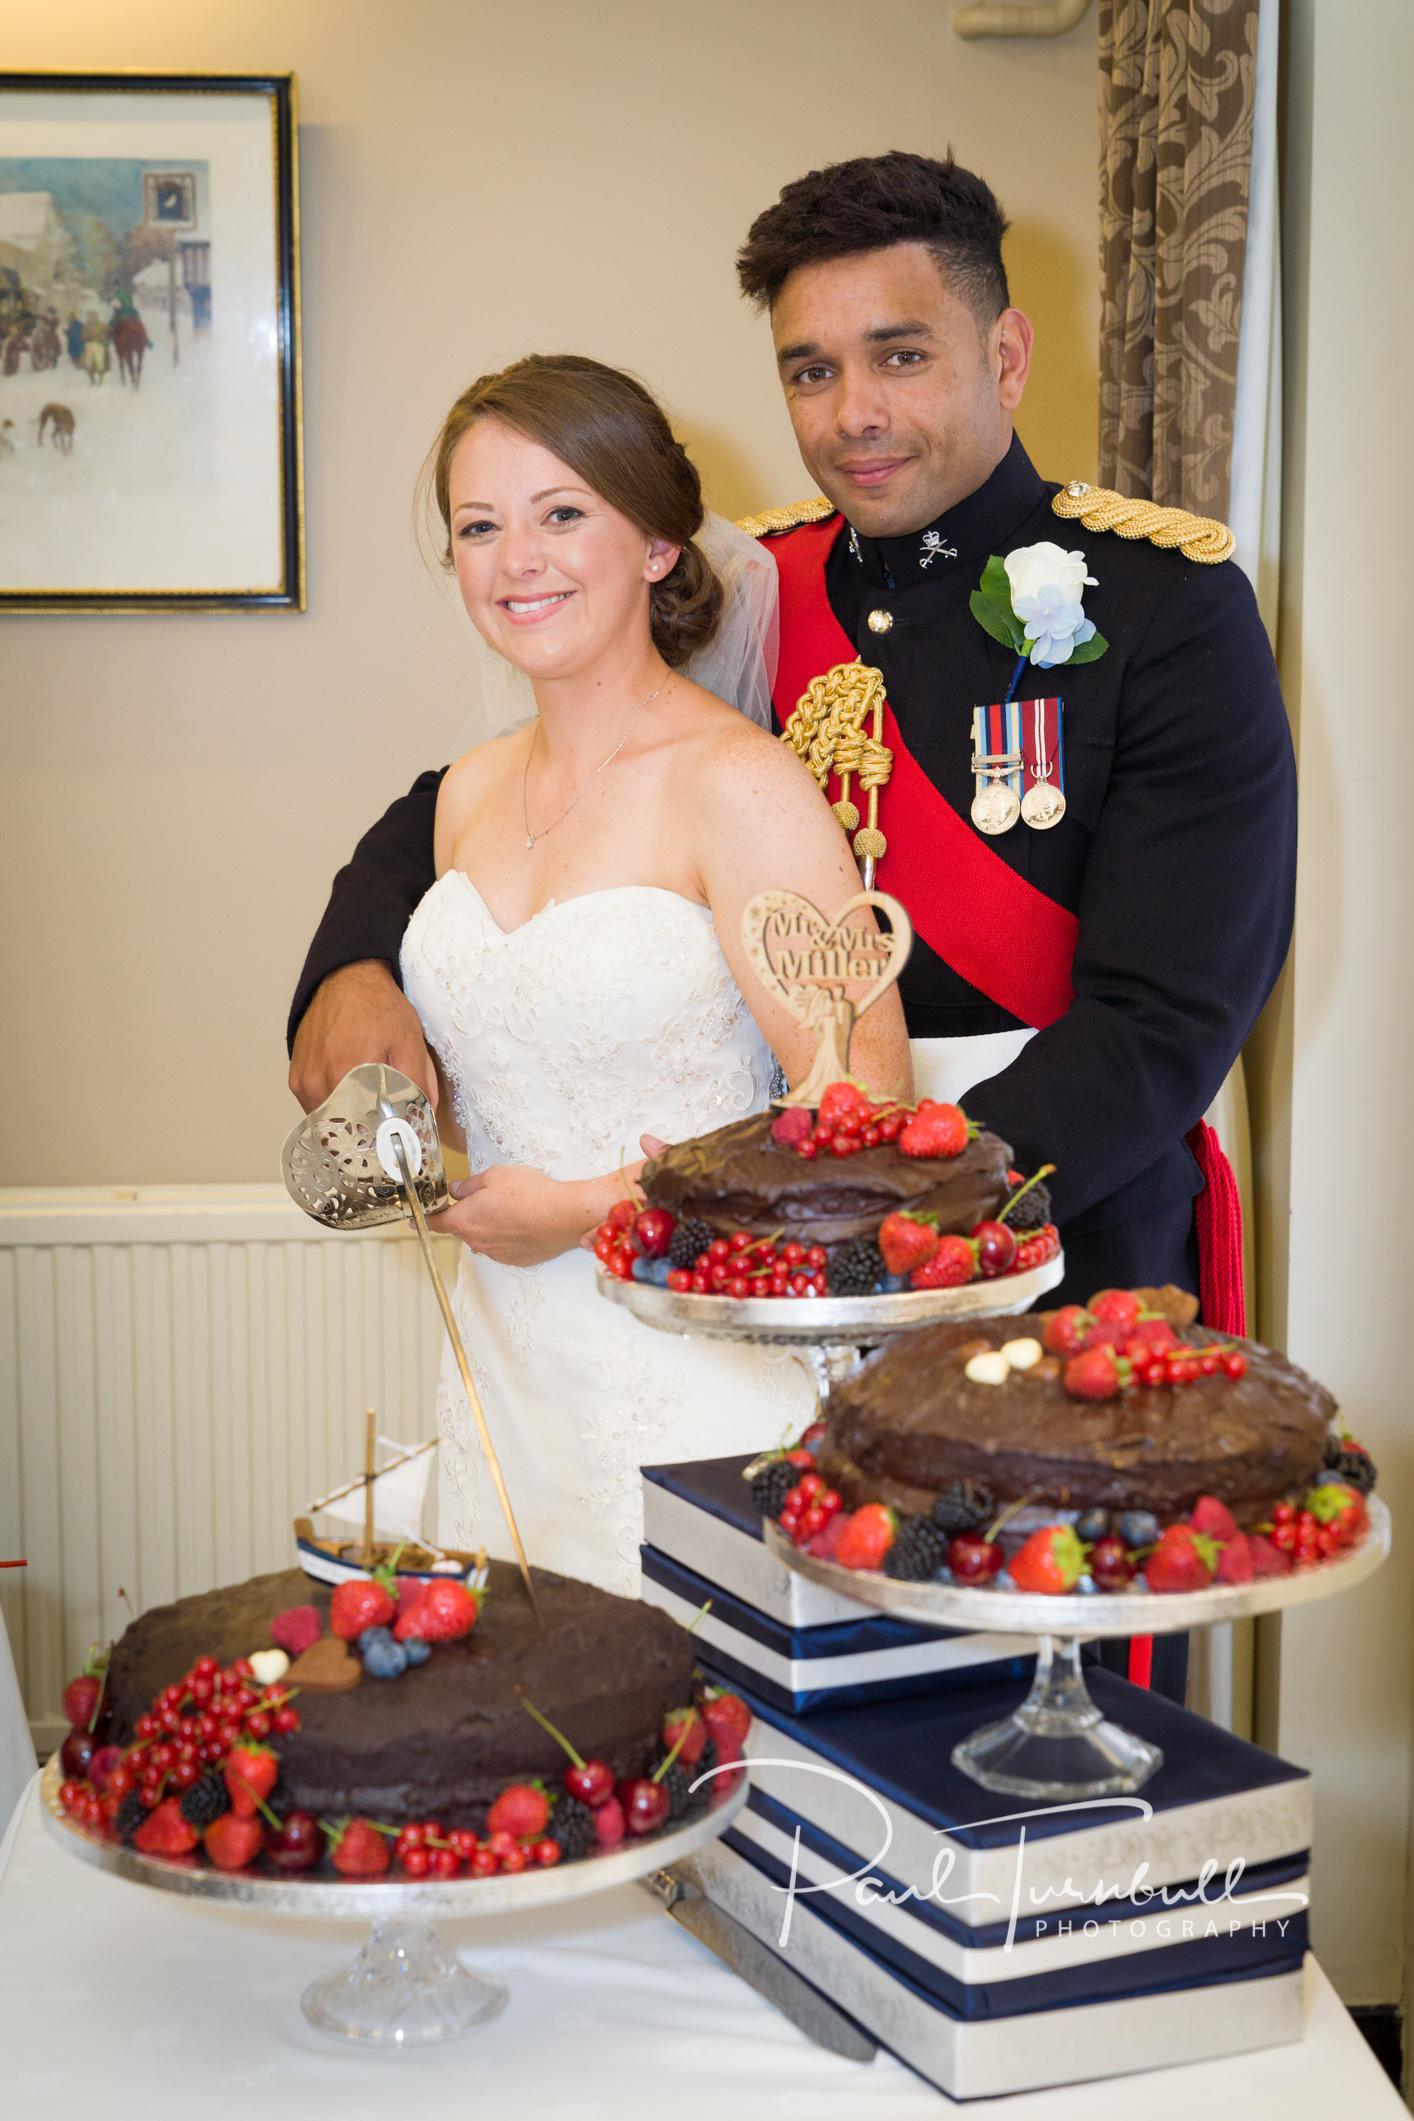 wedding-photographer-south-dalton-walkington-yorkshire-emma-james-058.jpg